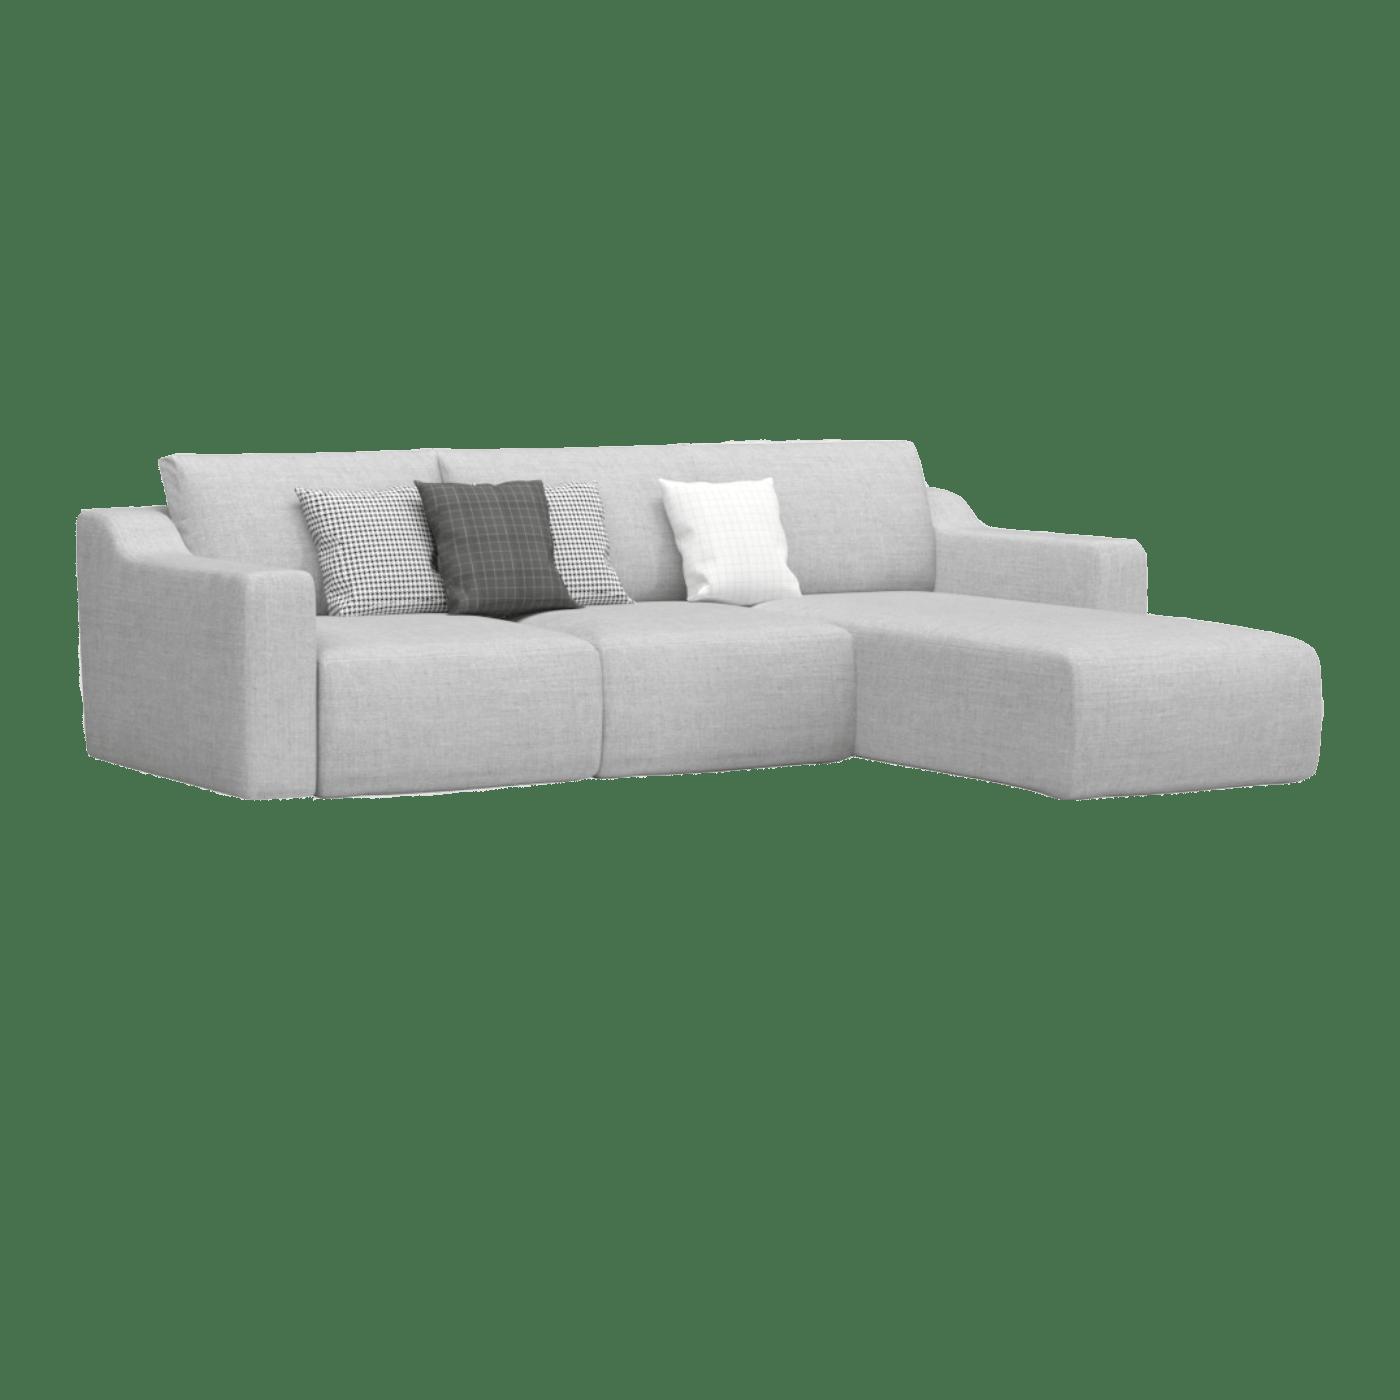 Sofá Ellender 2 lugares + Chaise